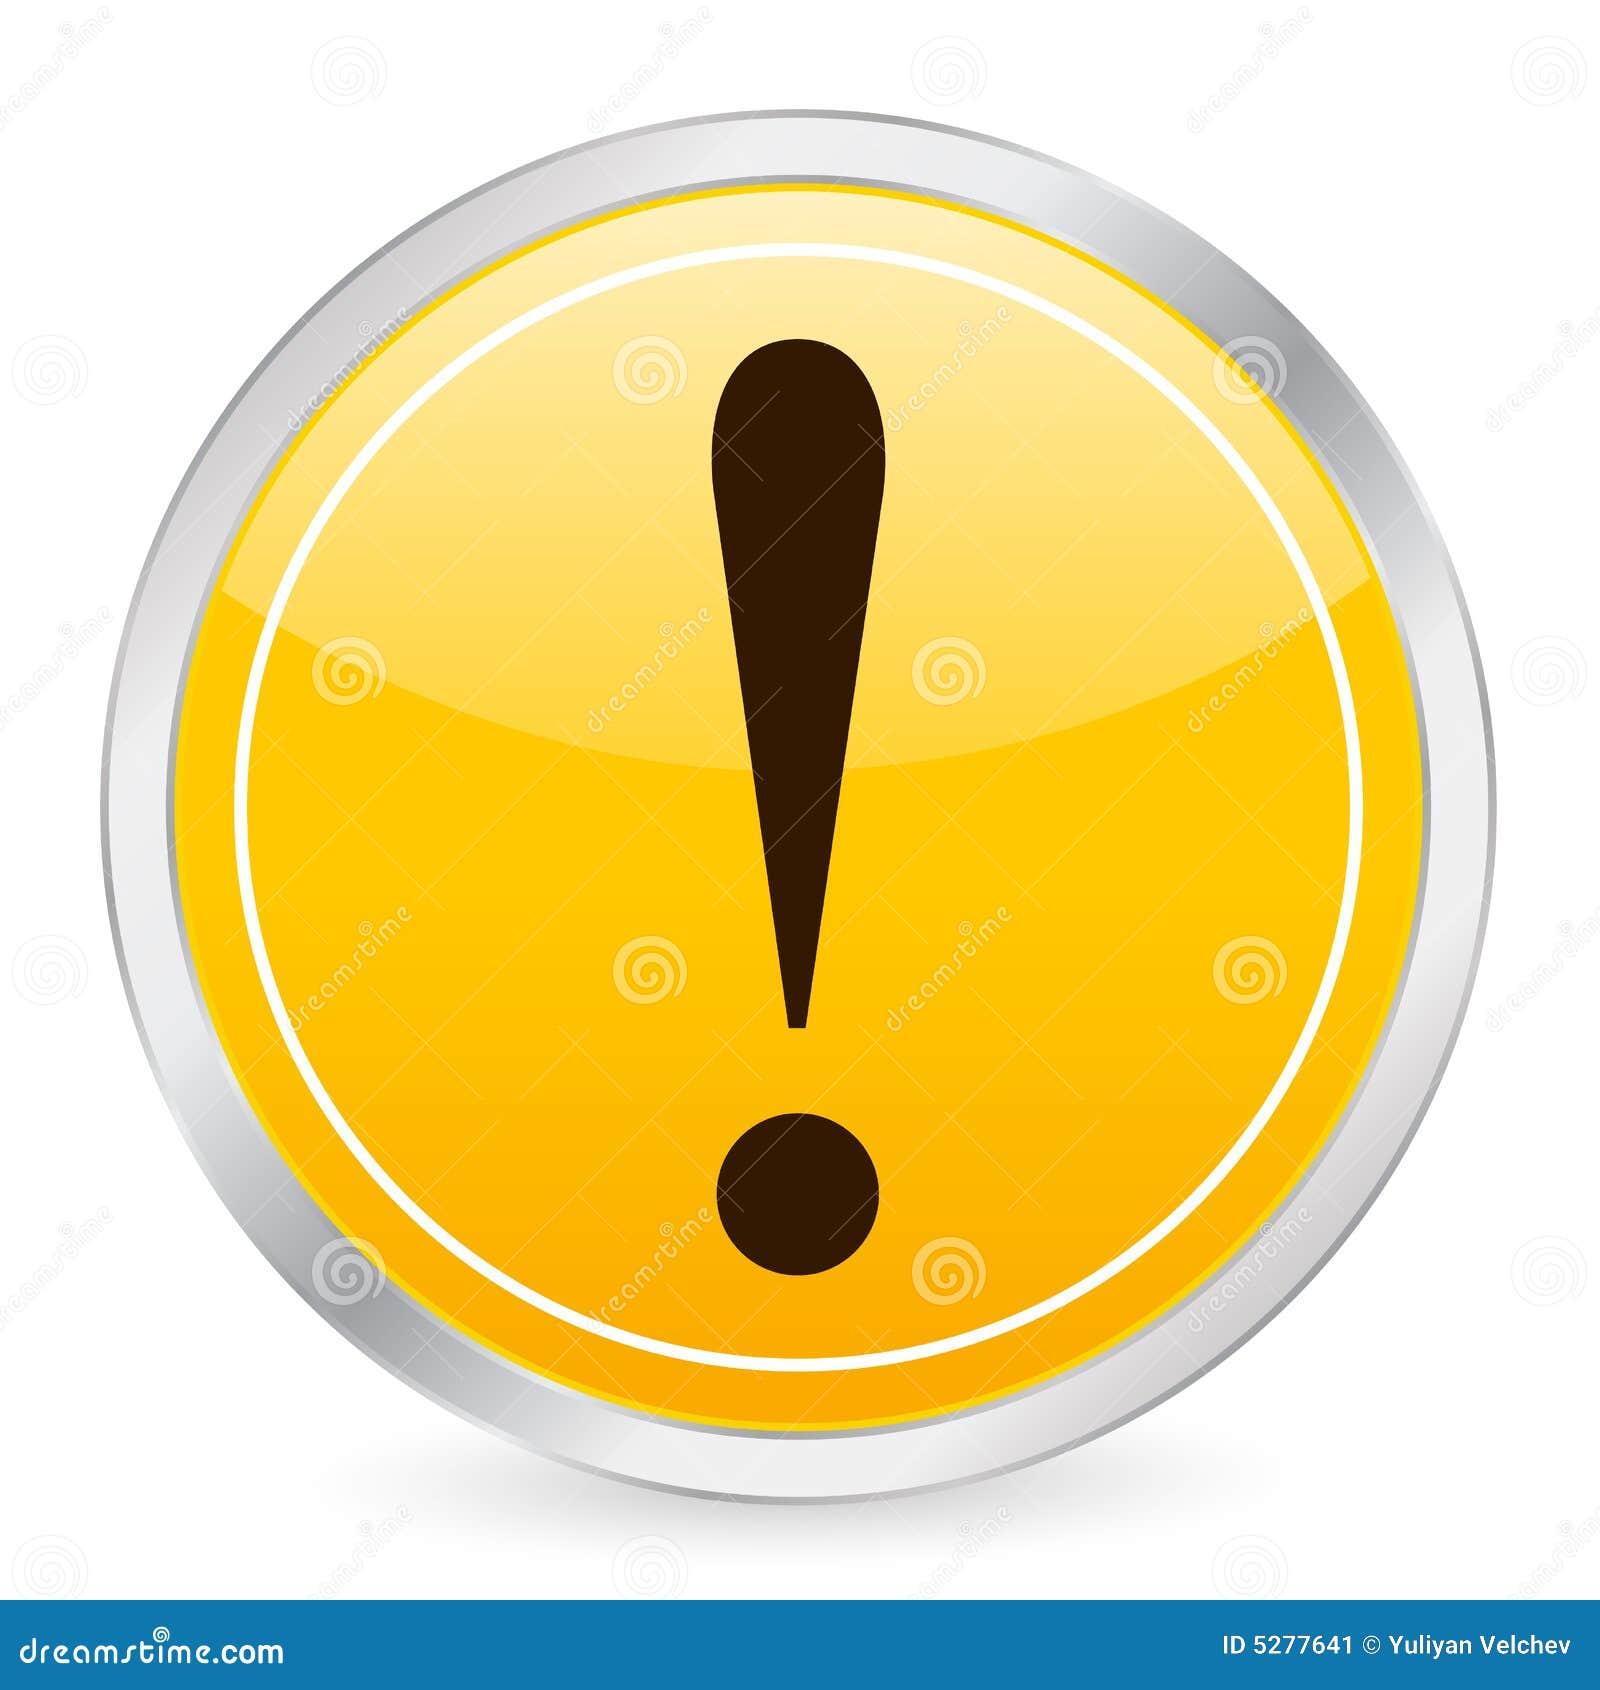 Exclamation Mark Yellow Circle Stock Illustration